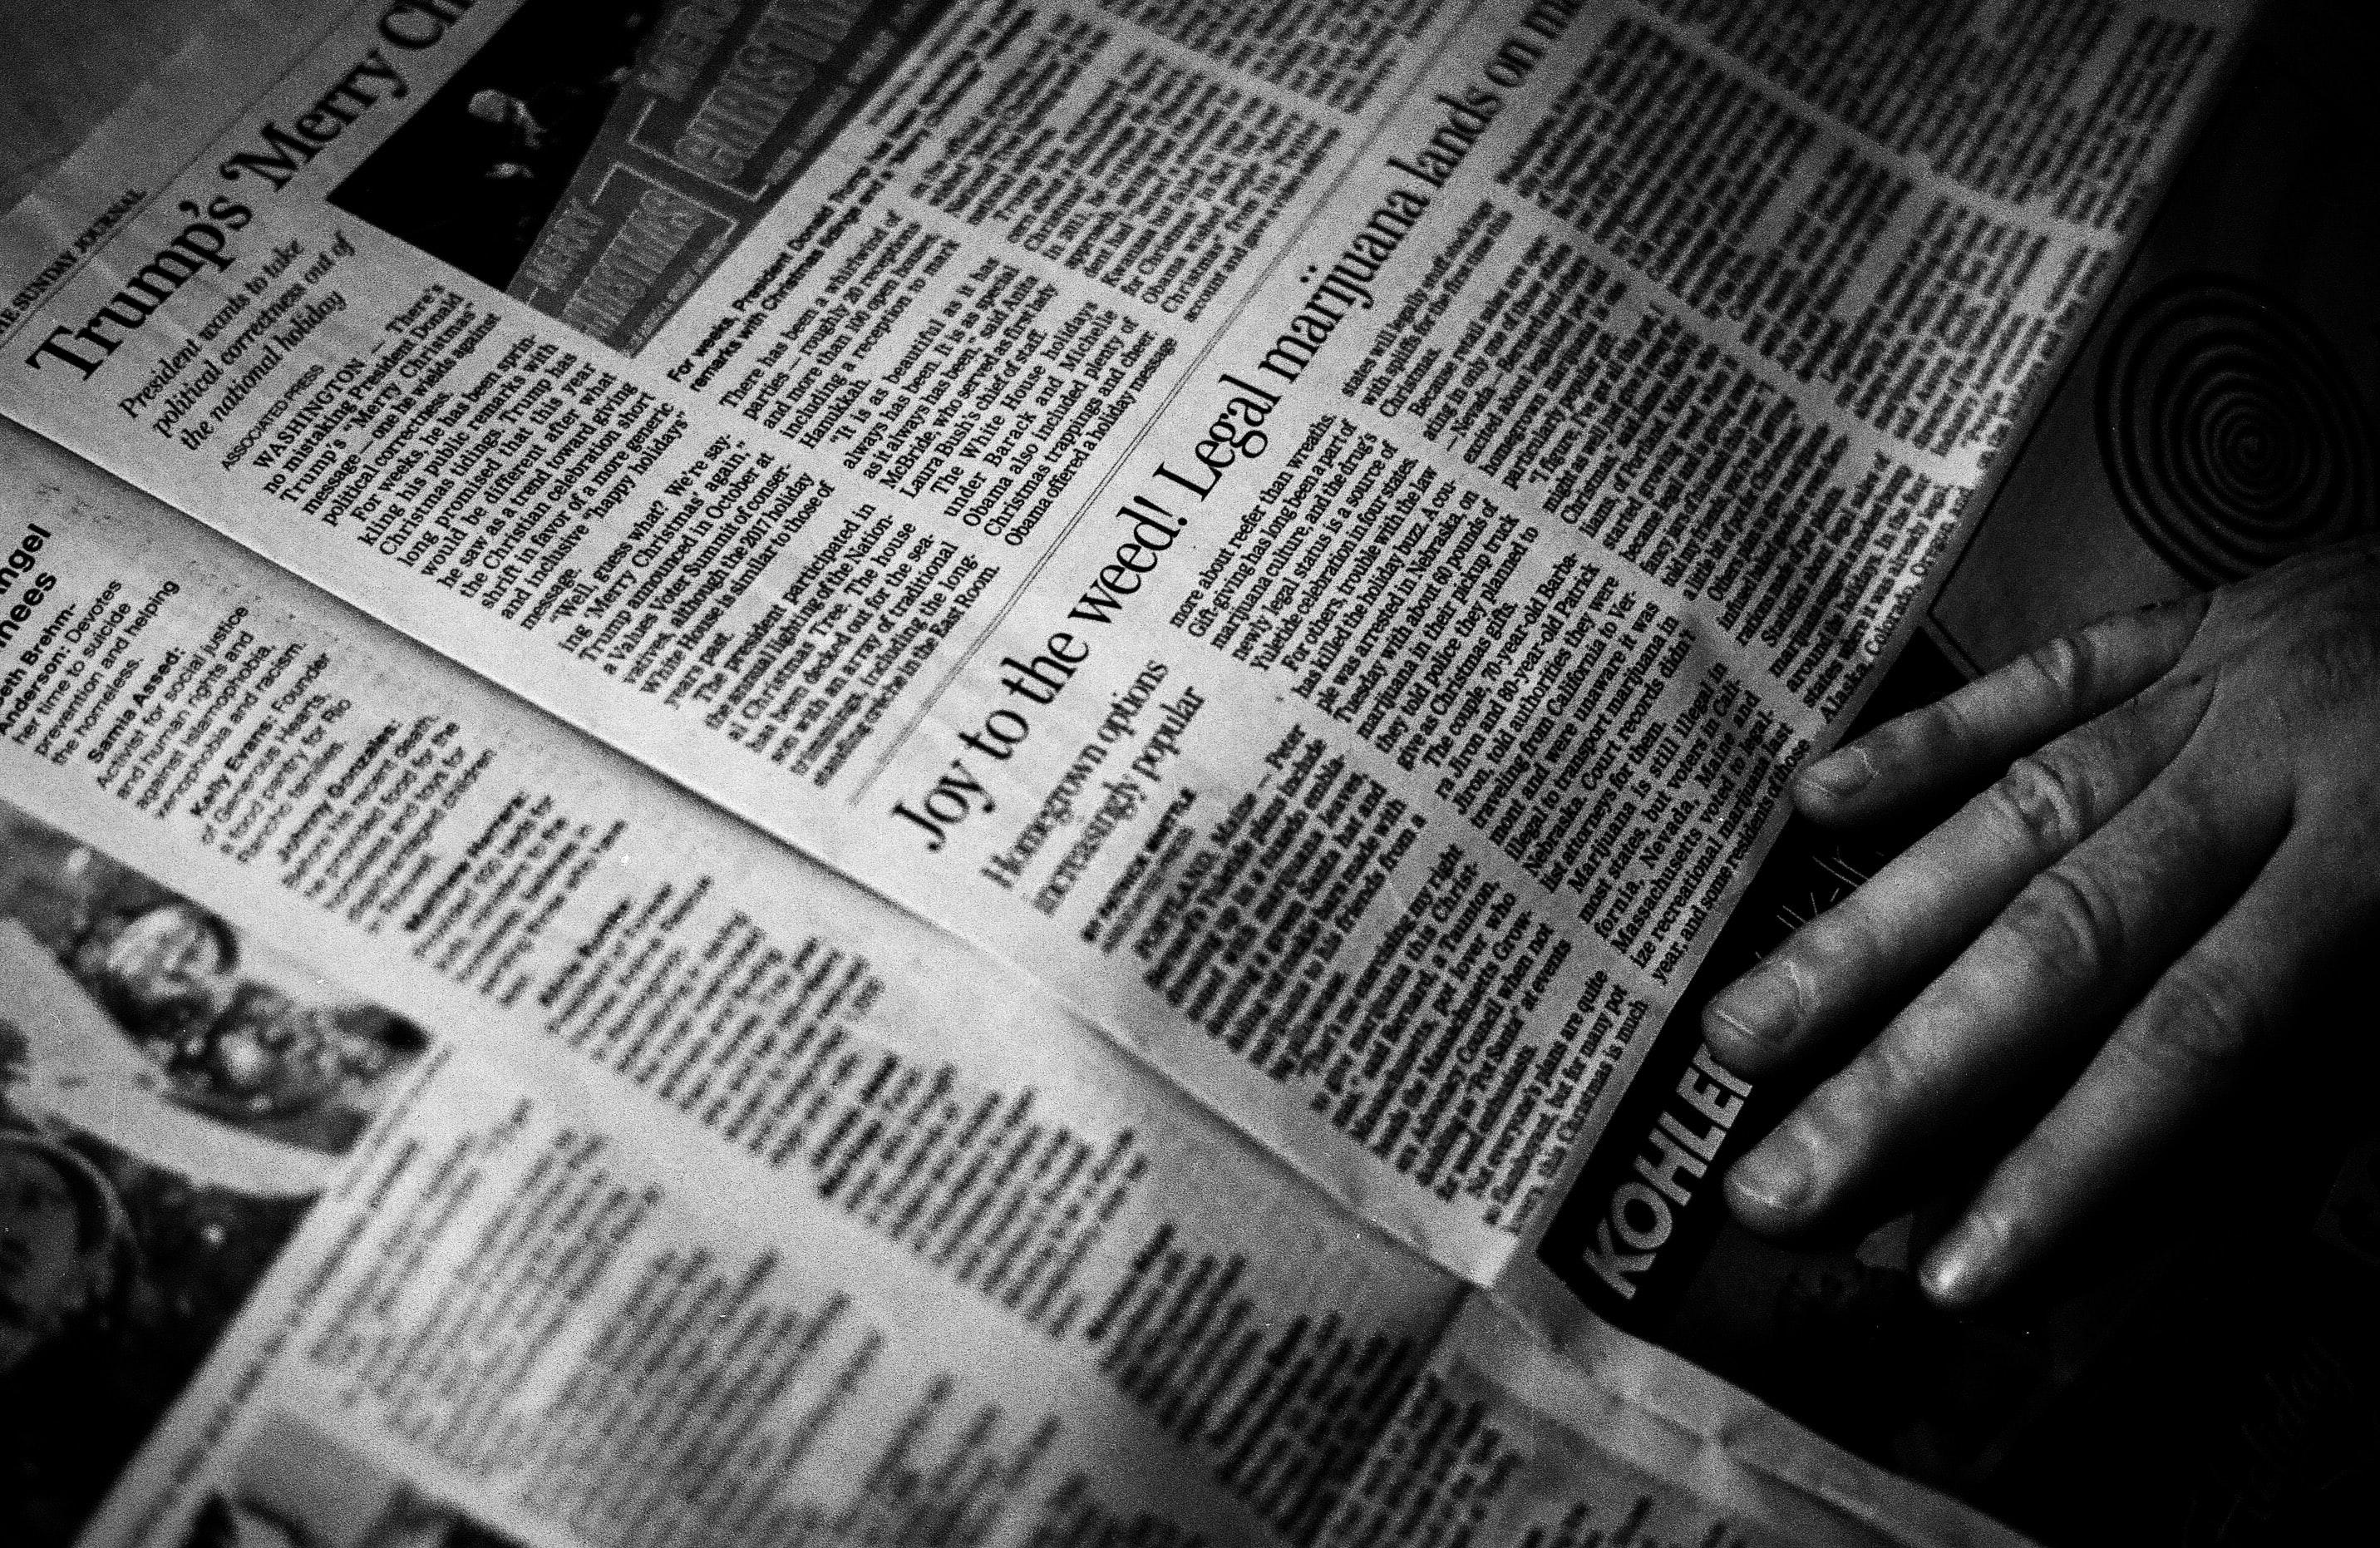 cannabis news as marketing tool